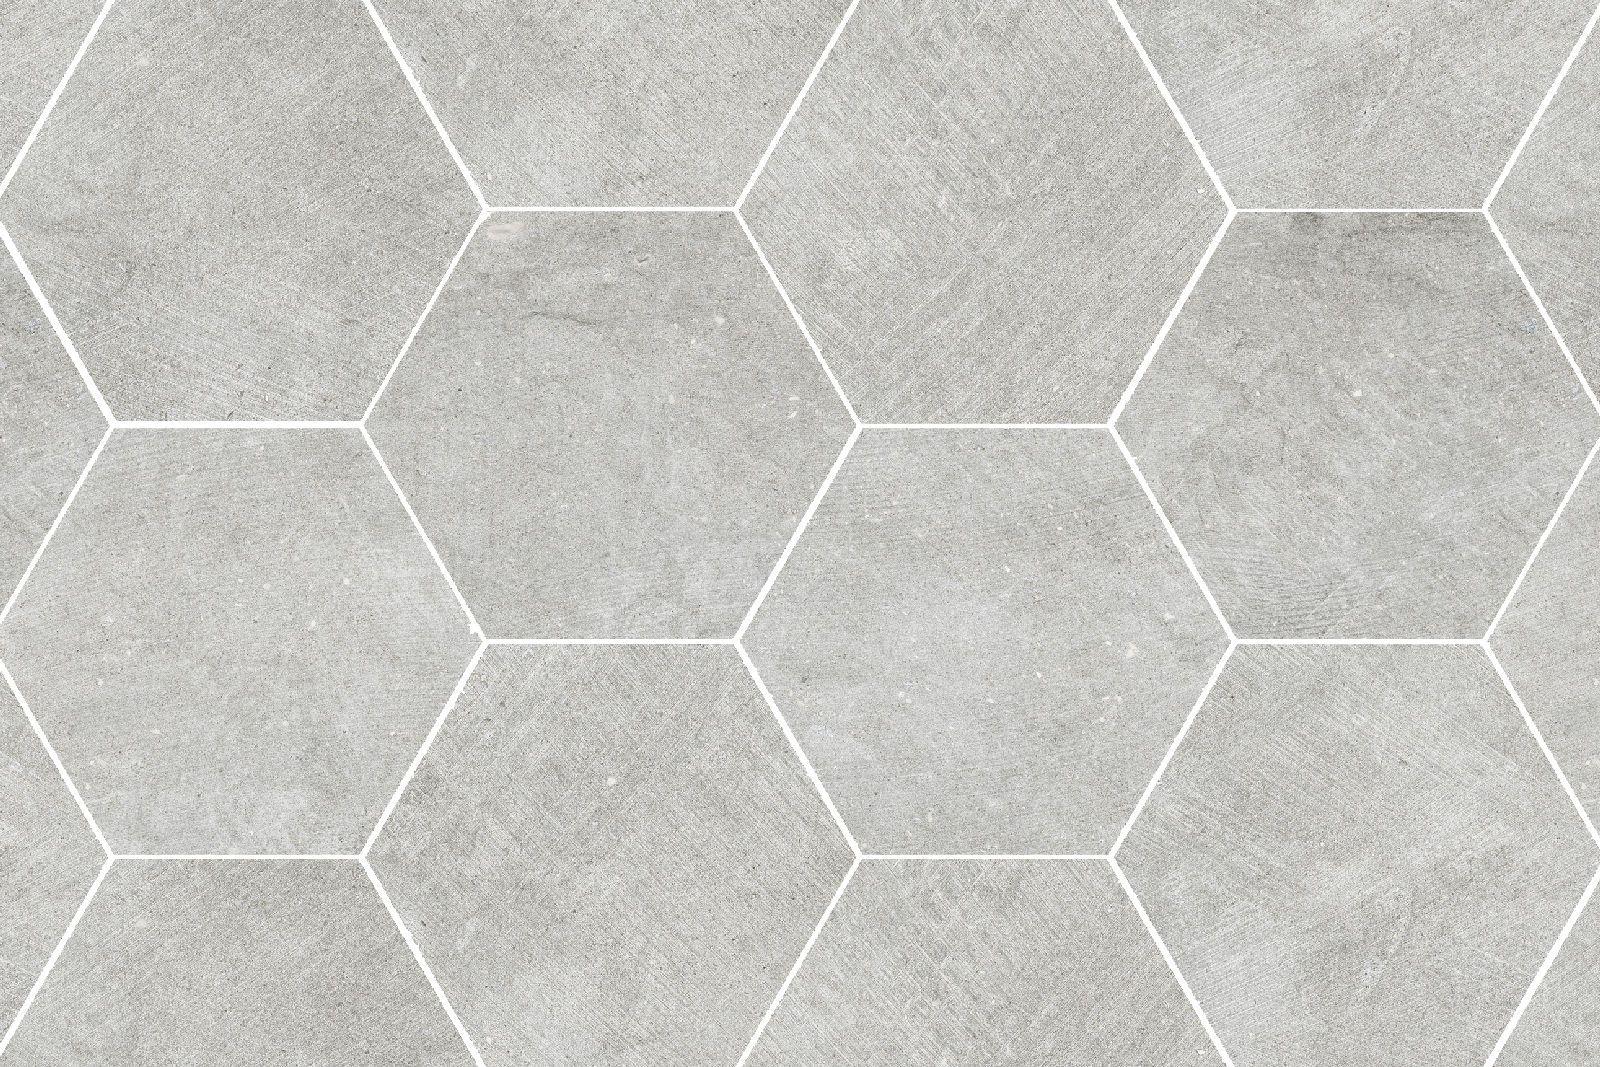 Porcelain Tile Hexagon Mosaic